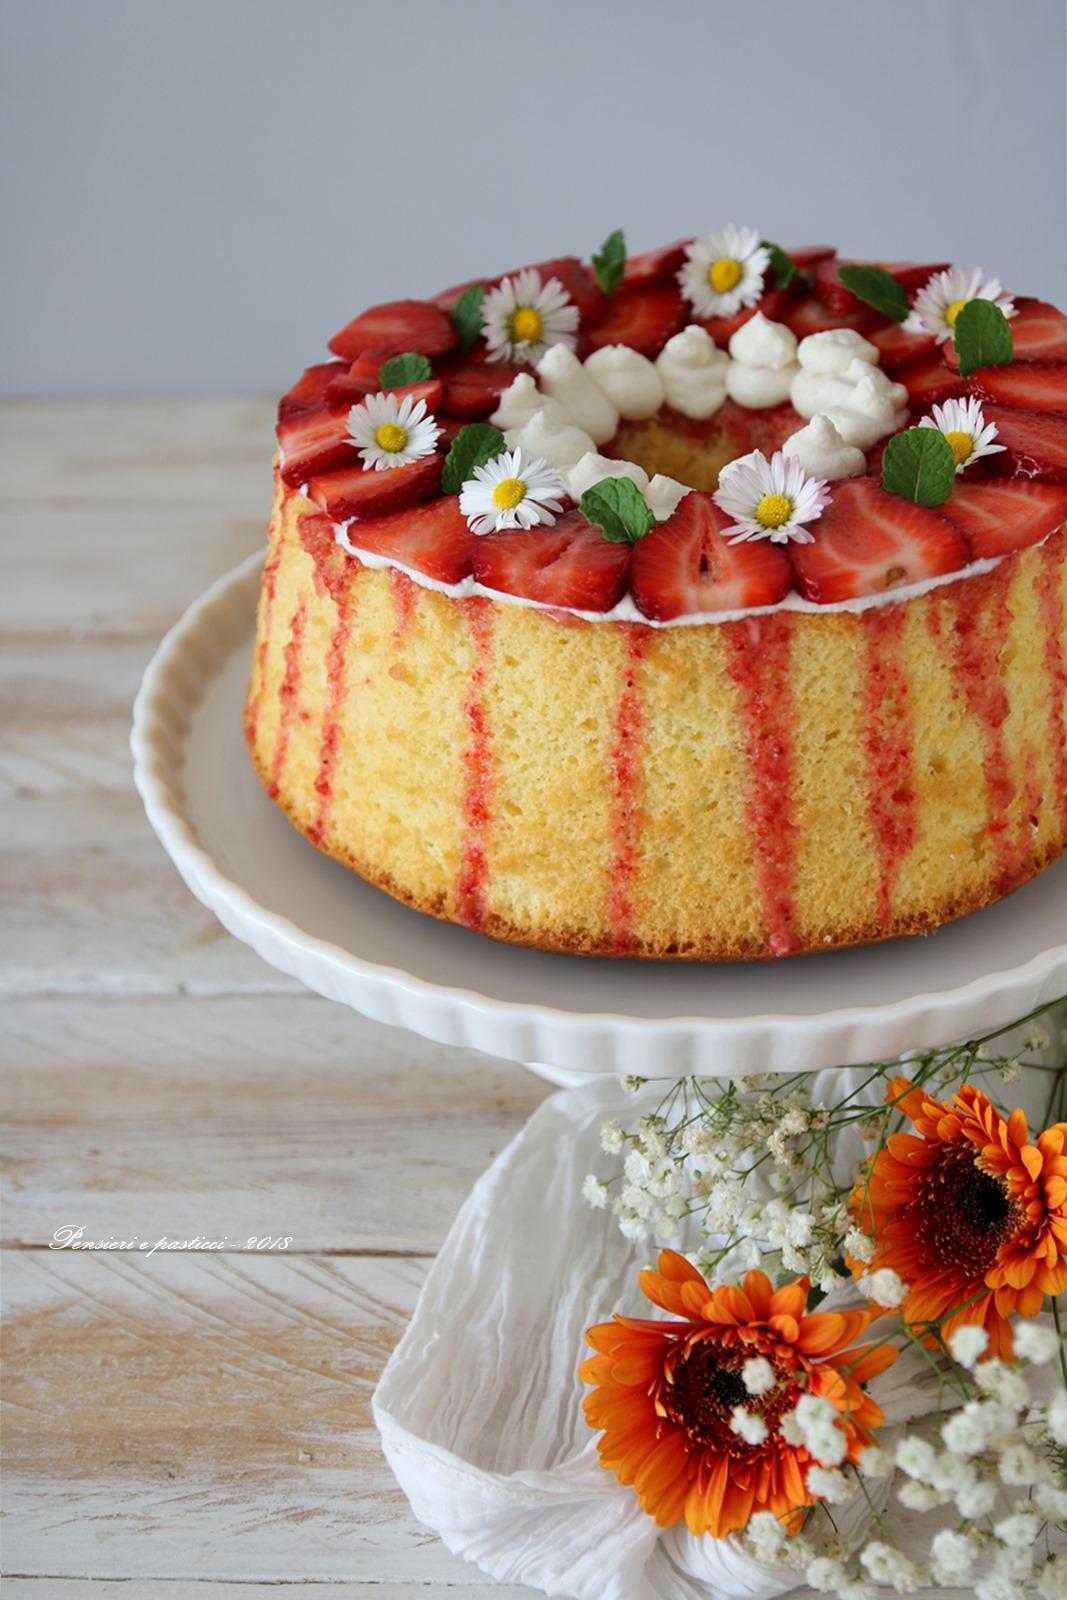 chiffon cake al limone, crema e fragole